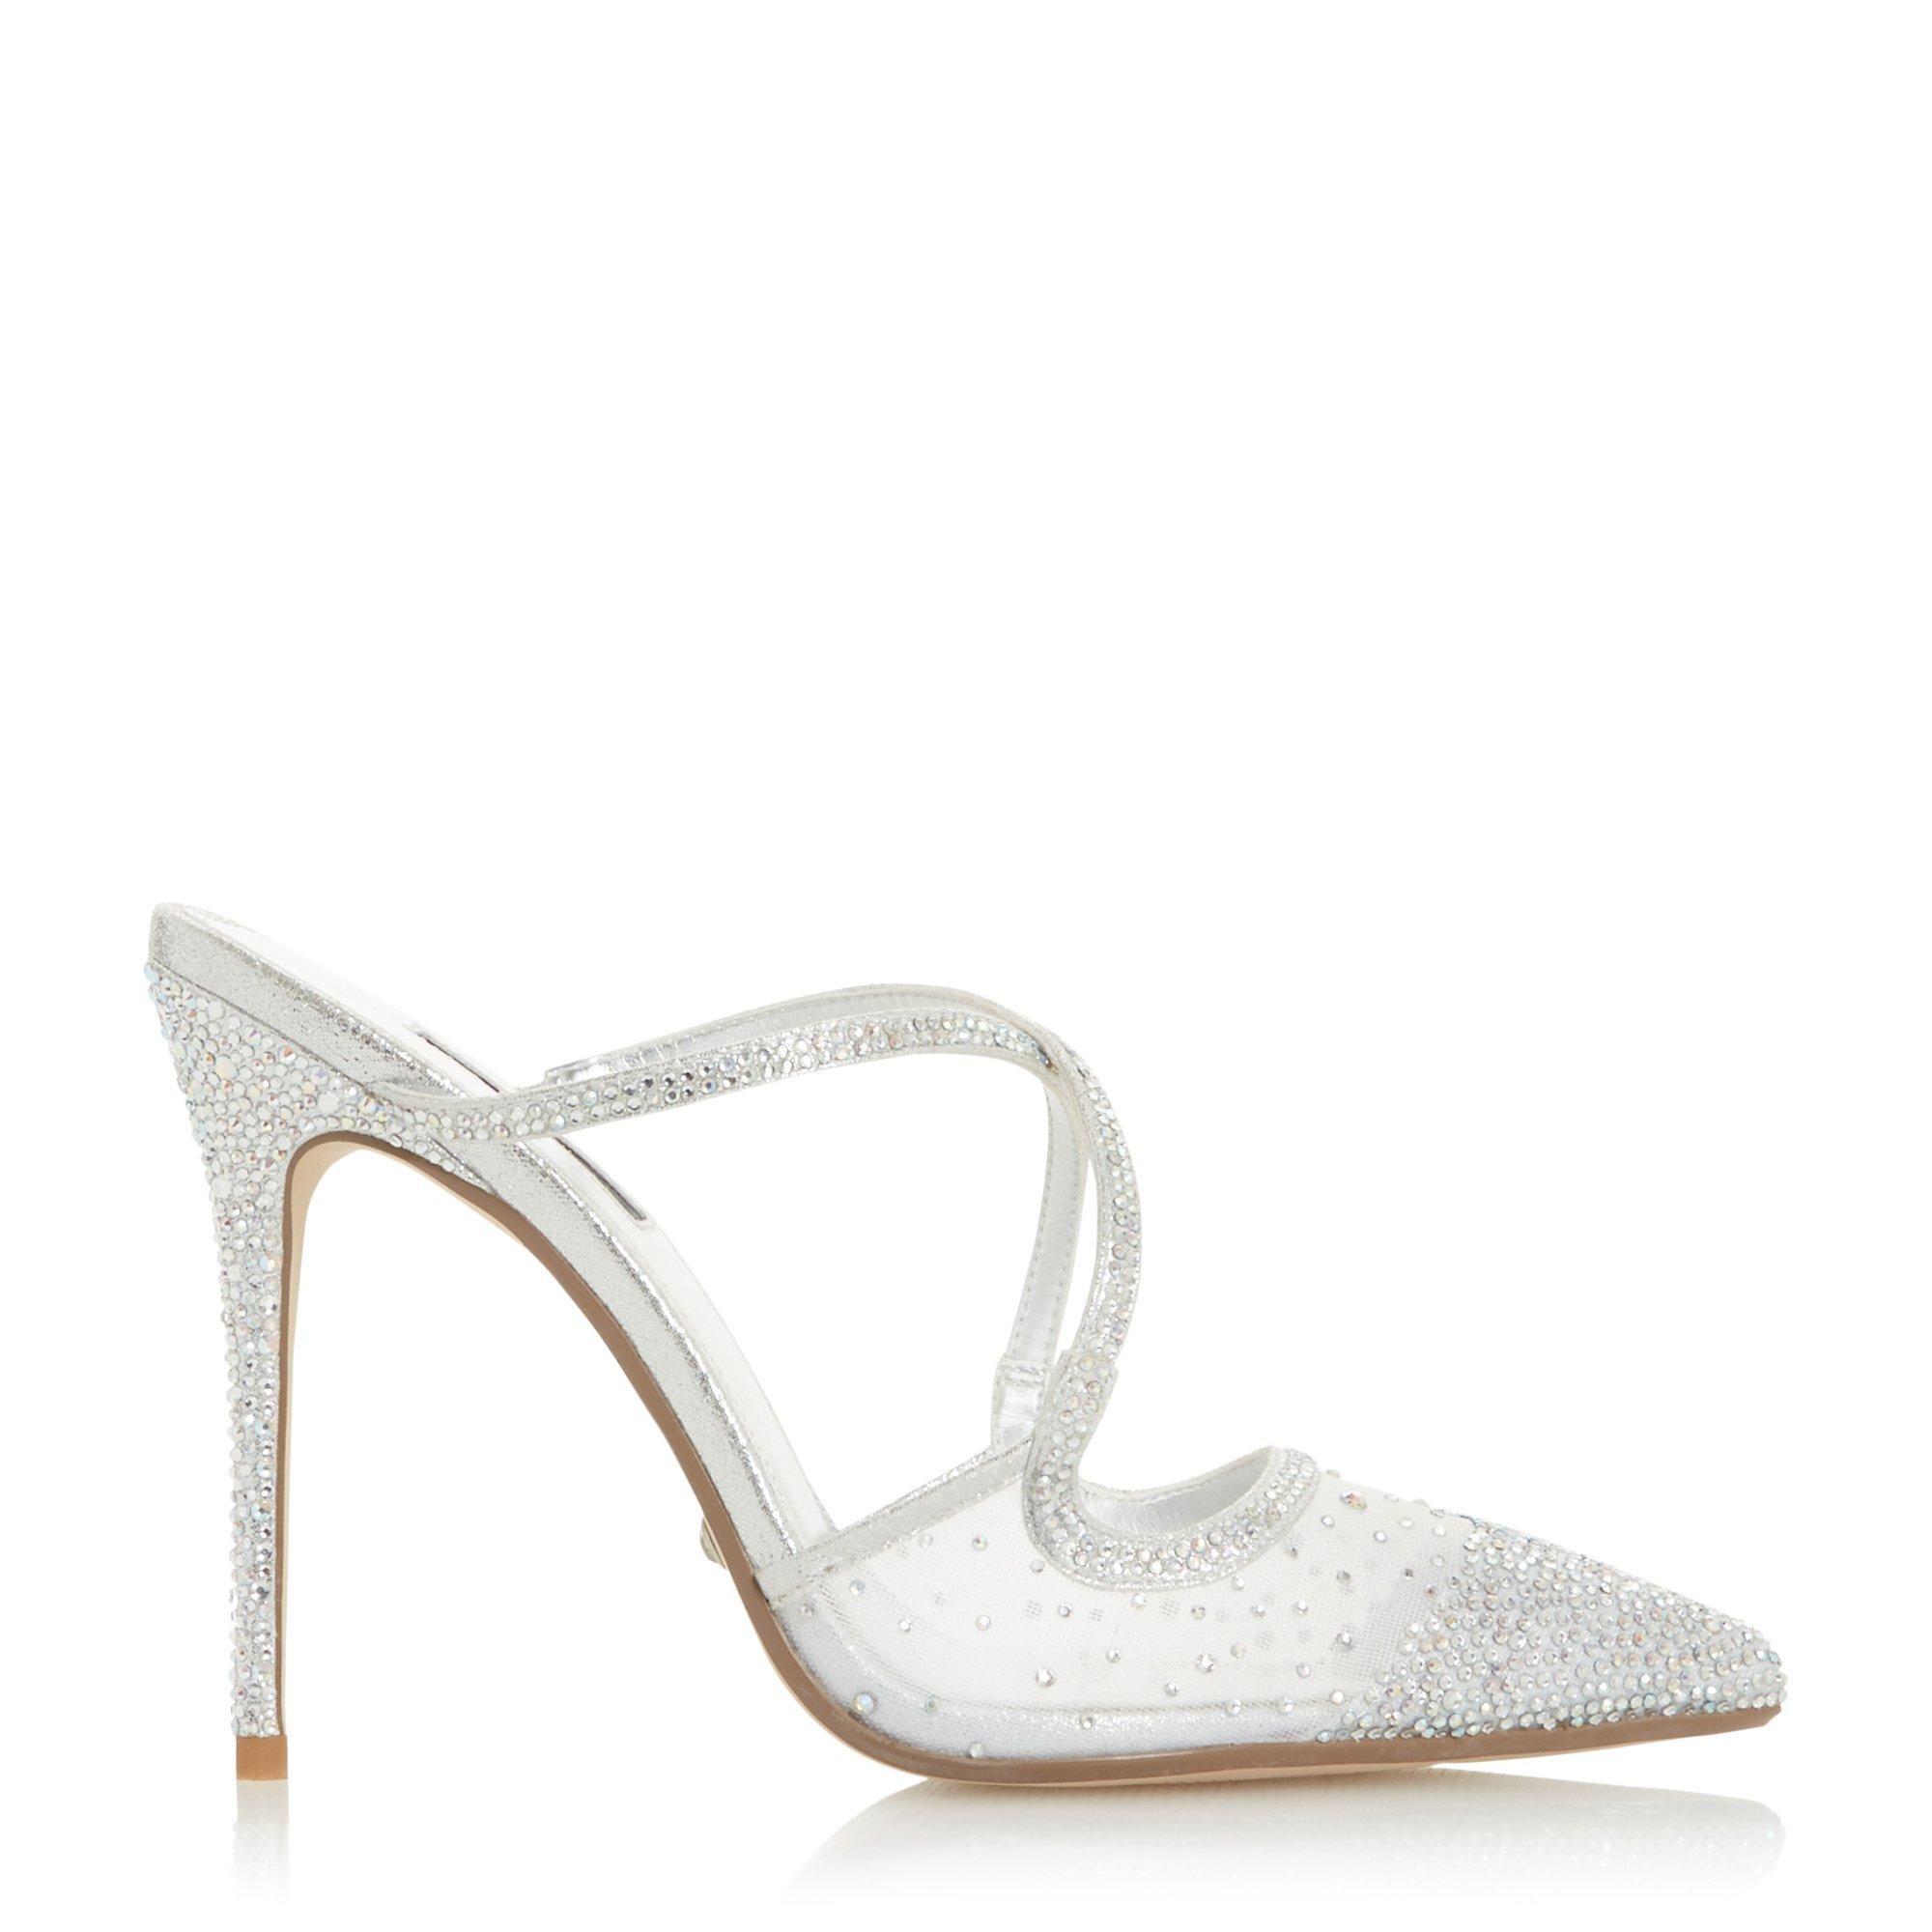 Dune Ladies CHARISMA Embellished High Heel Court Shoes